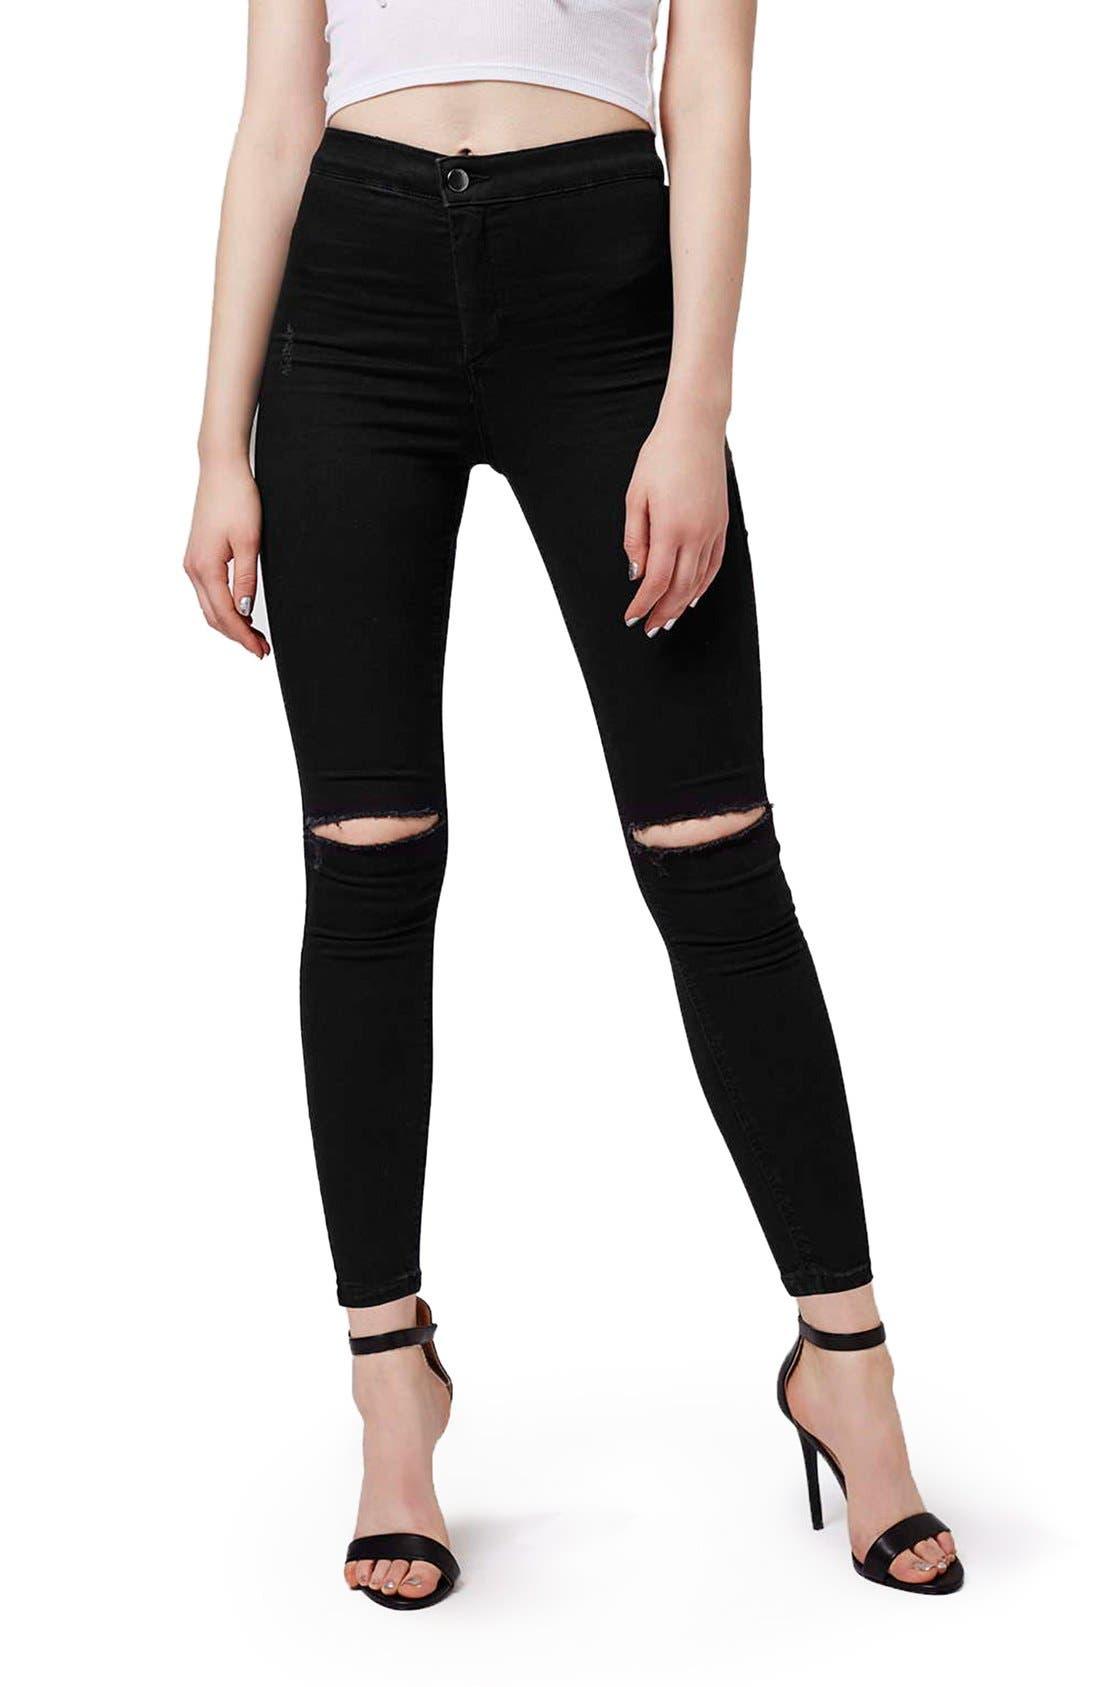 Alternate Image 1 Selected - Topshop Moto 'Joni' Ripped Skinny Jeans (Petite)